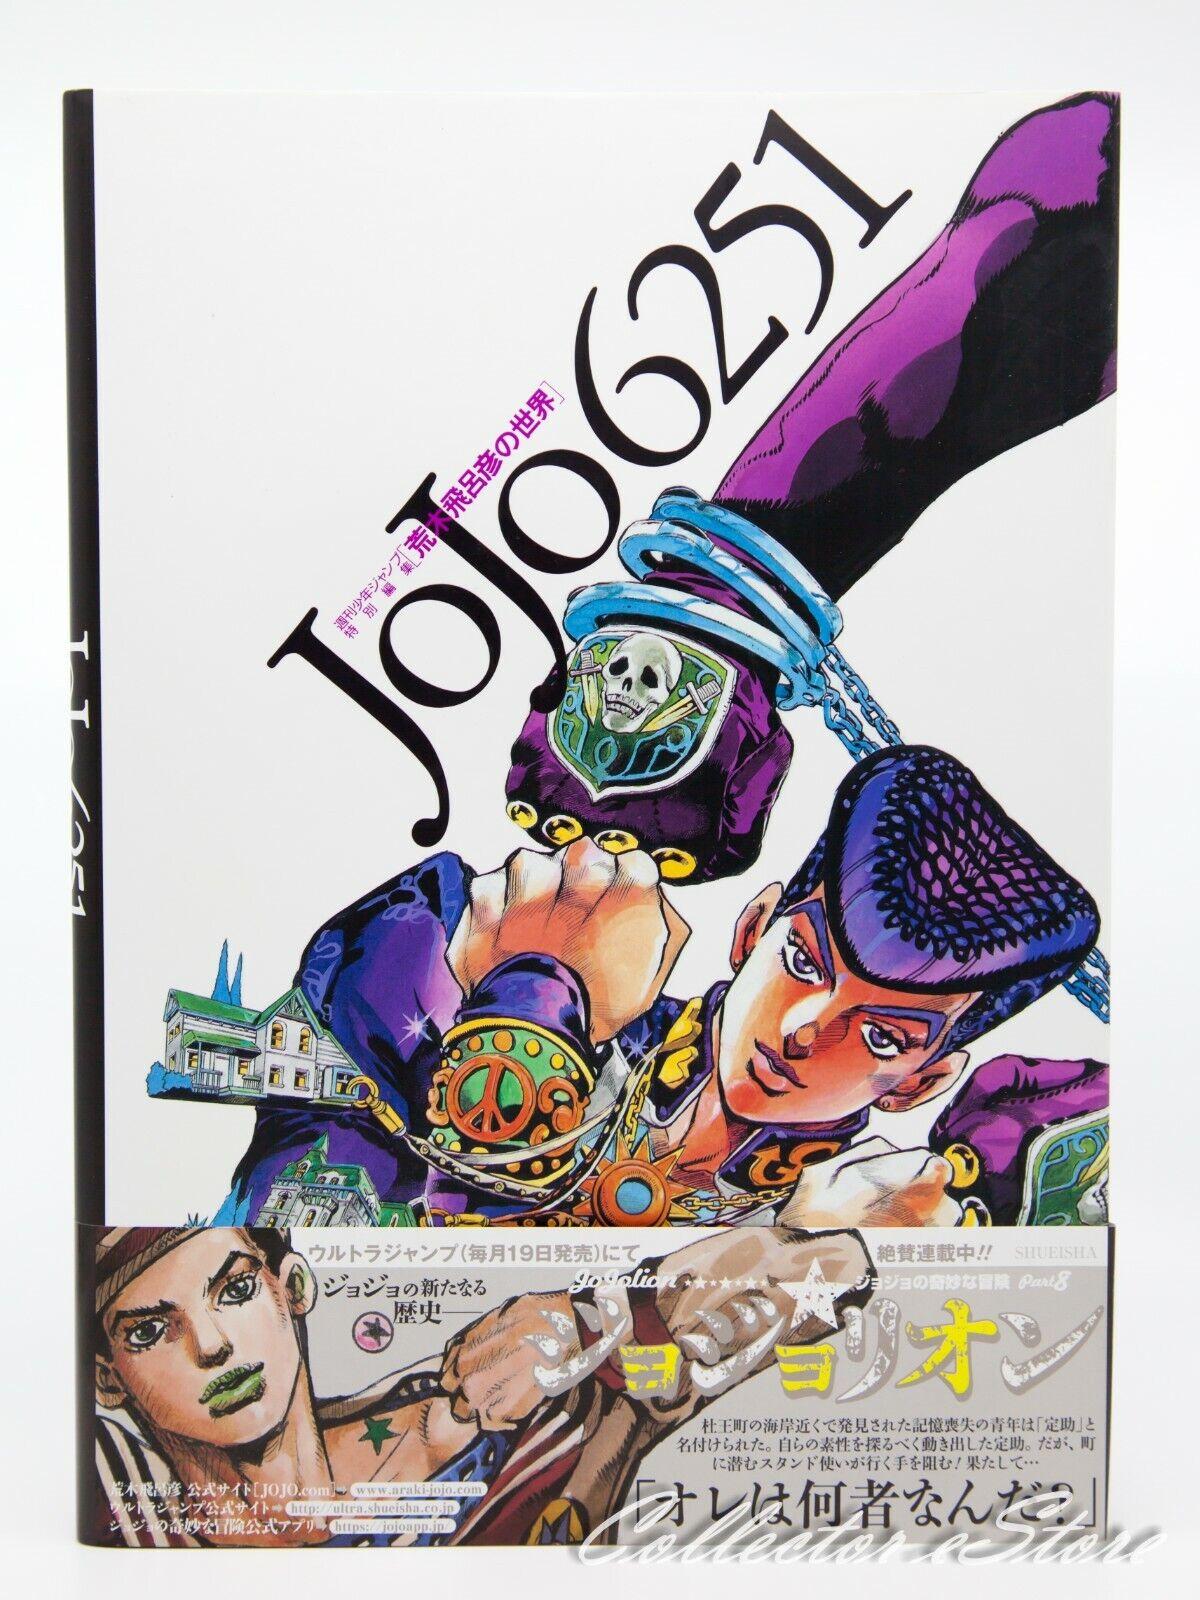 20 Jahre Garantie. Jojo 20251 The World of Hirohiko Araki Art Book ...